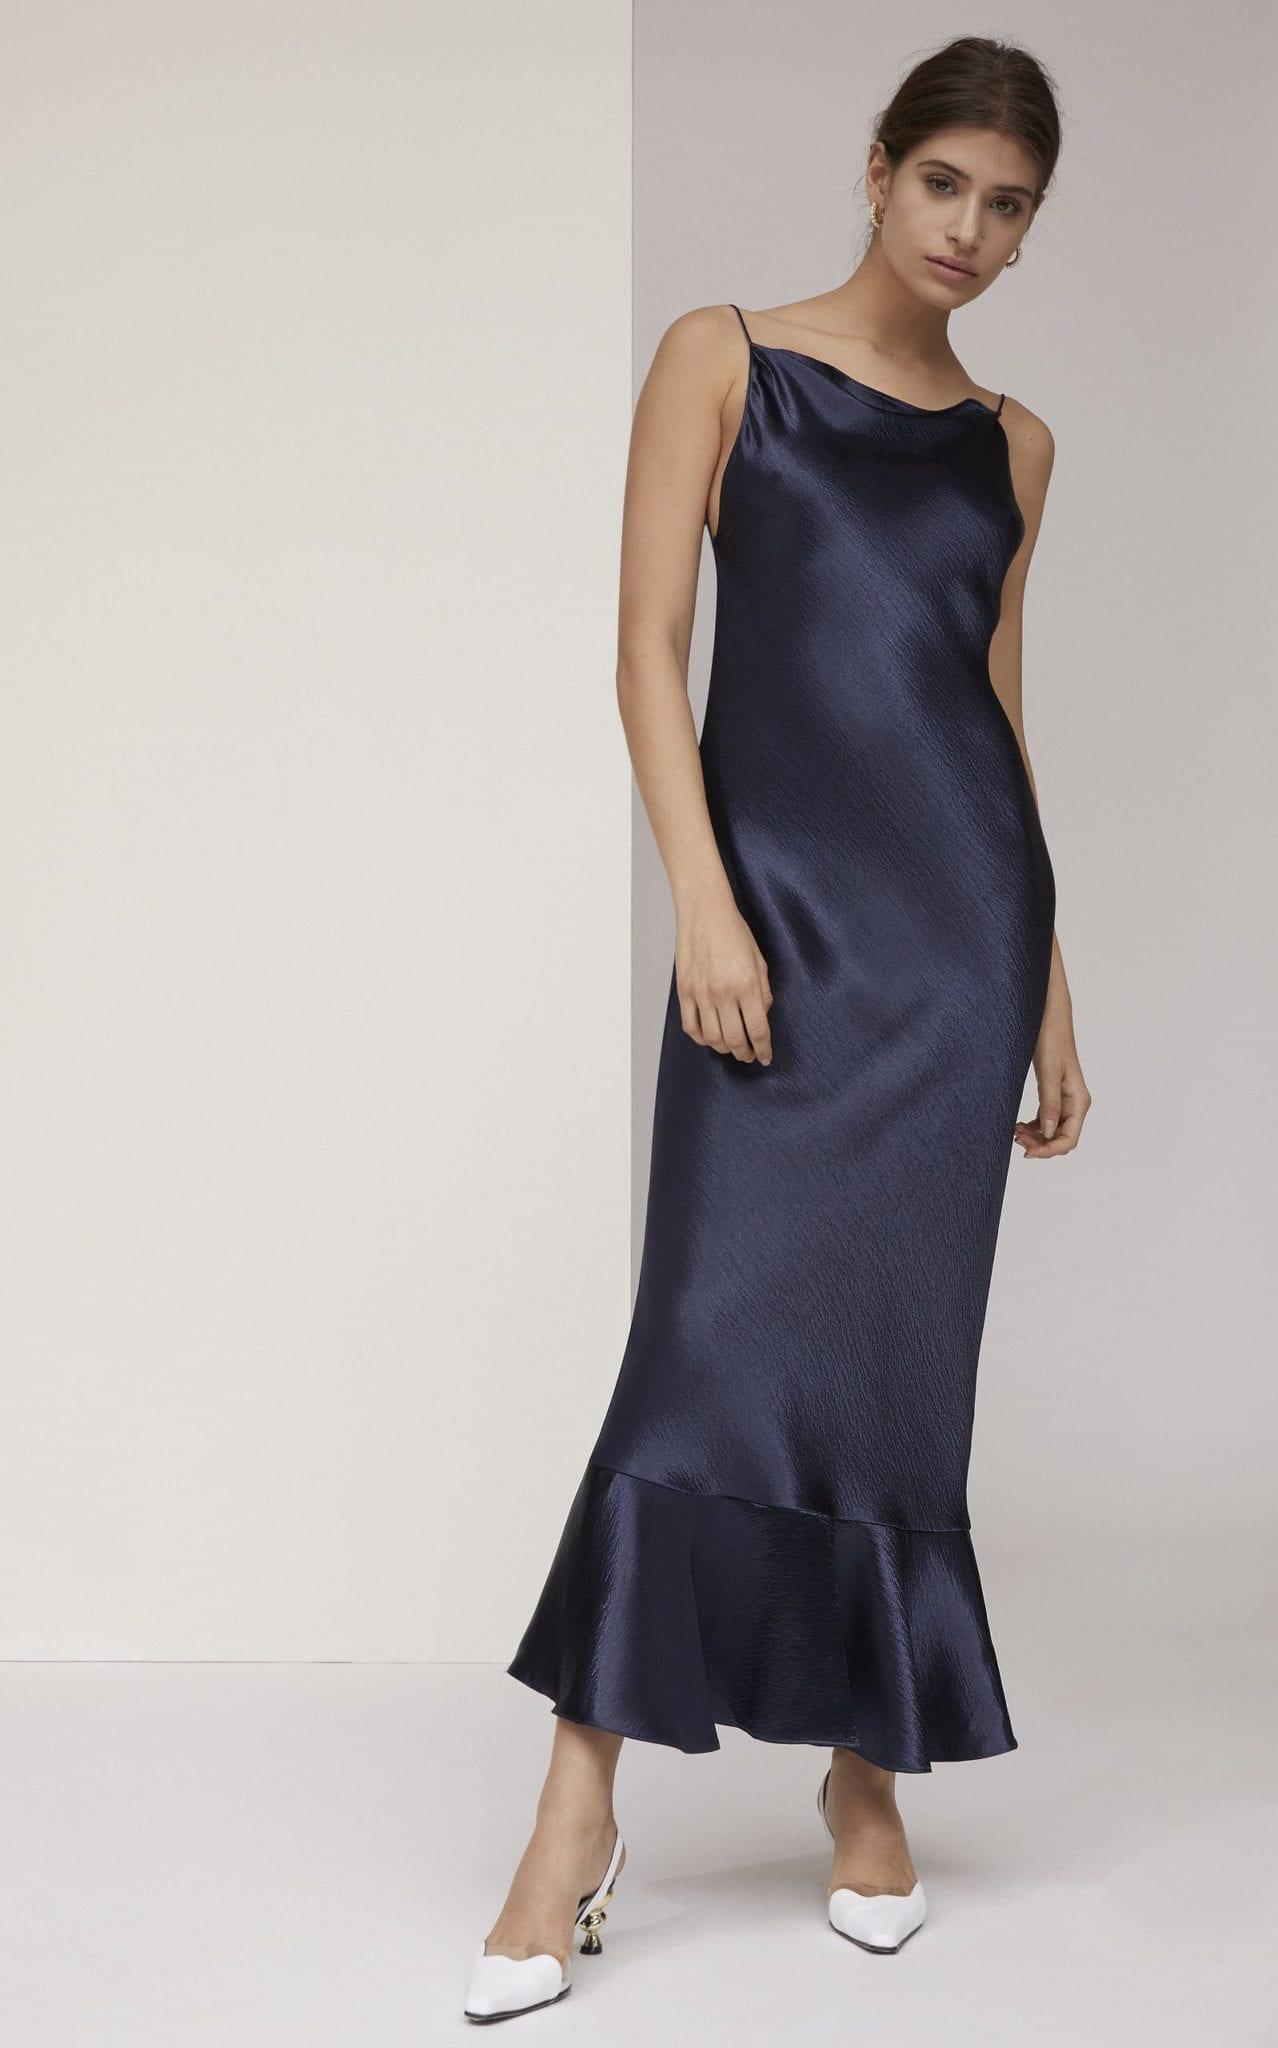 Innika Choo Iva Scalloped Cotton Midi Dress We Select